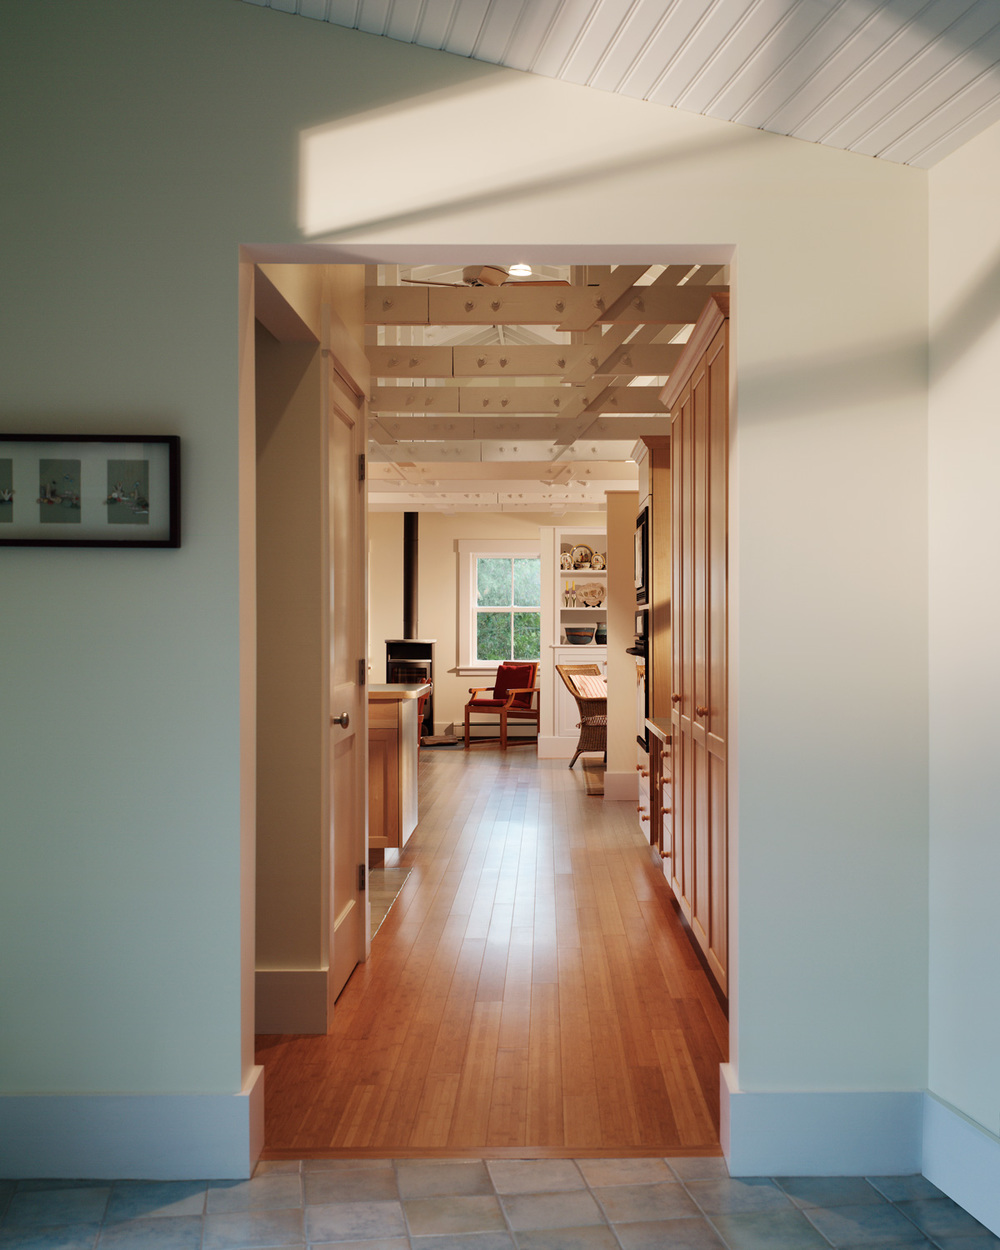 Kass-Interior-from-Entry.jpg